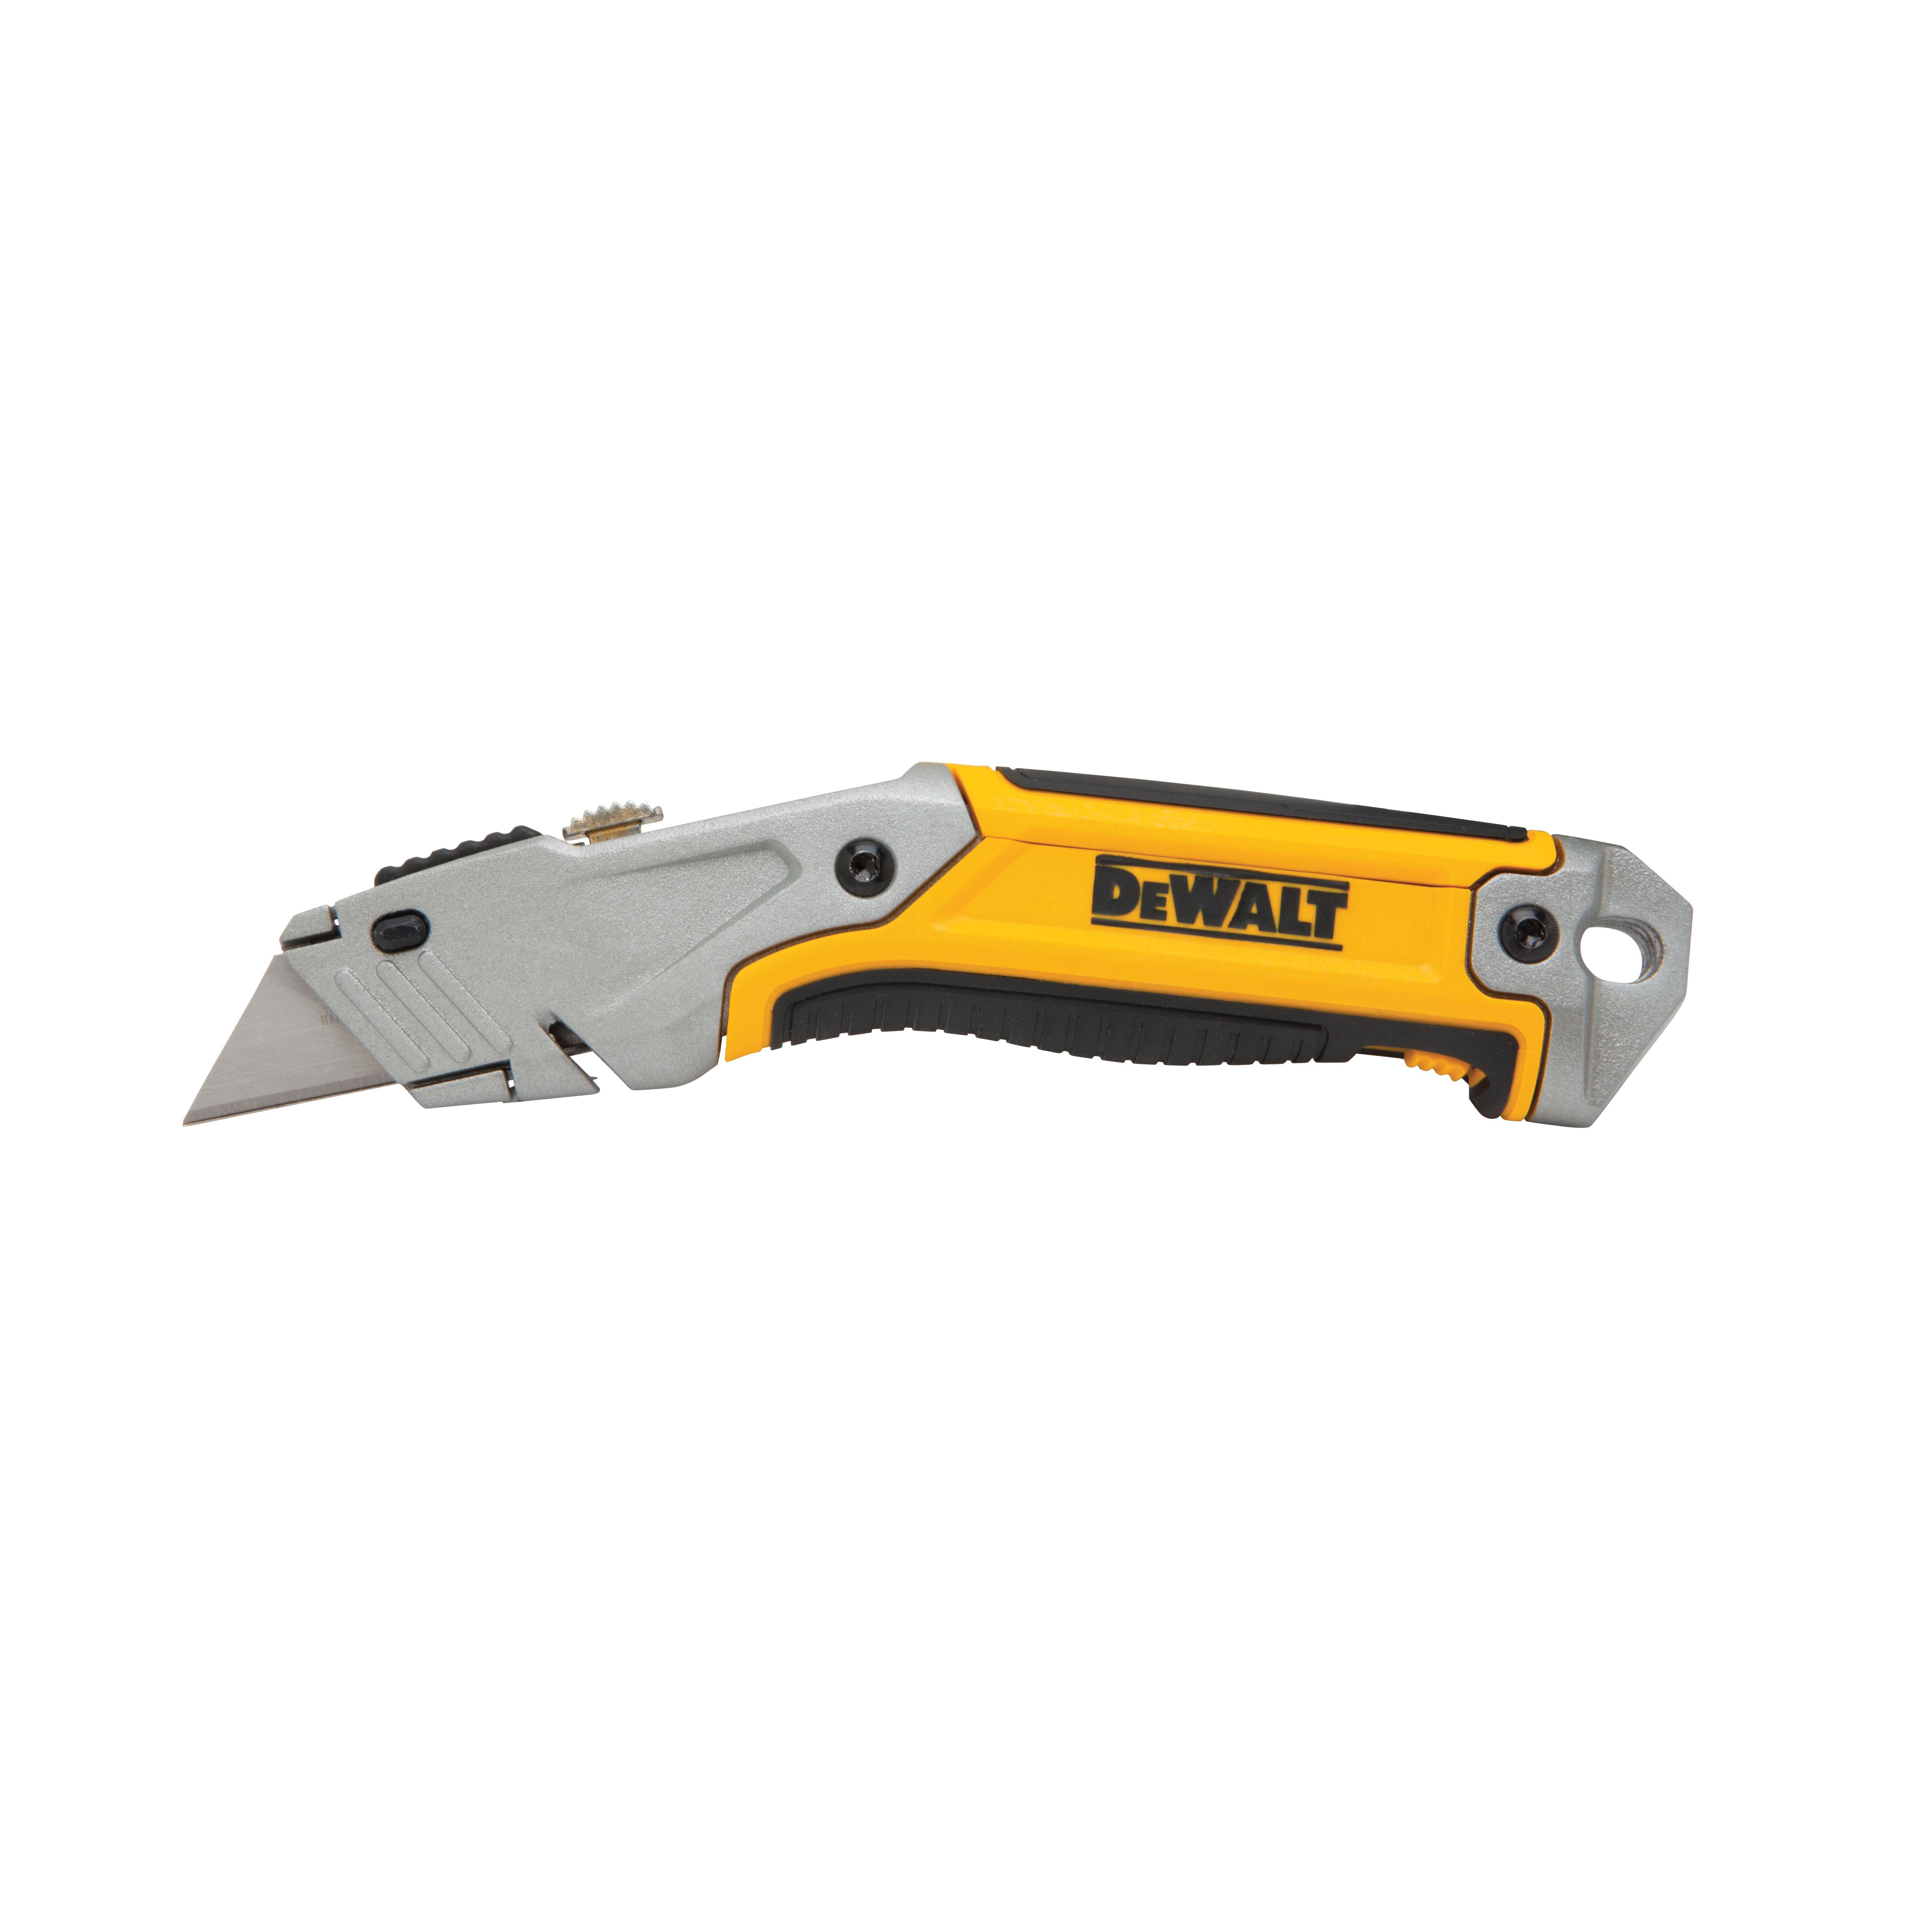 Picture of DeWALT DWHT10046 Utility Knife, 2-1/2 in L Blade, 1-1/4 in W Blade, Carbon Steel Blade, Ergonomic Handle